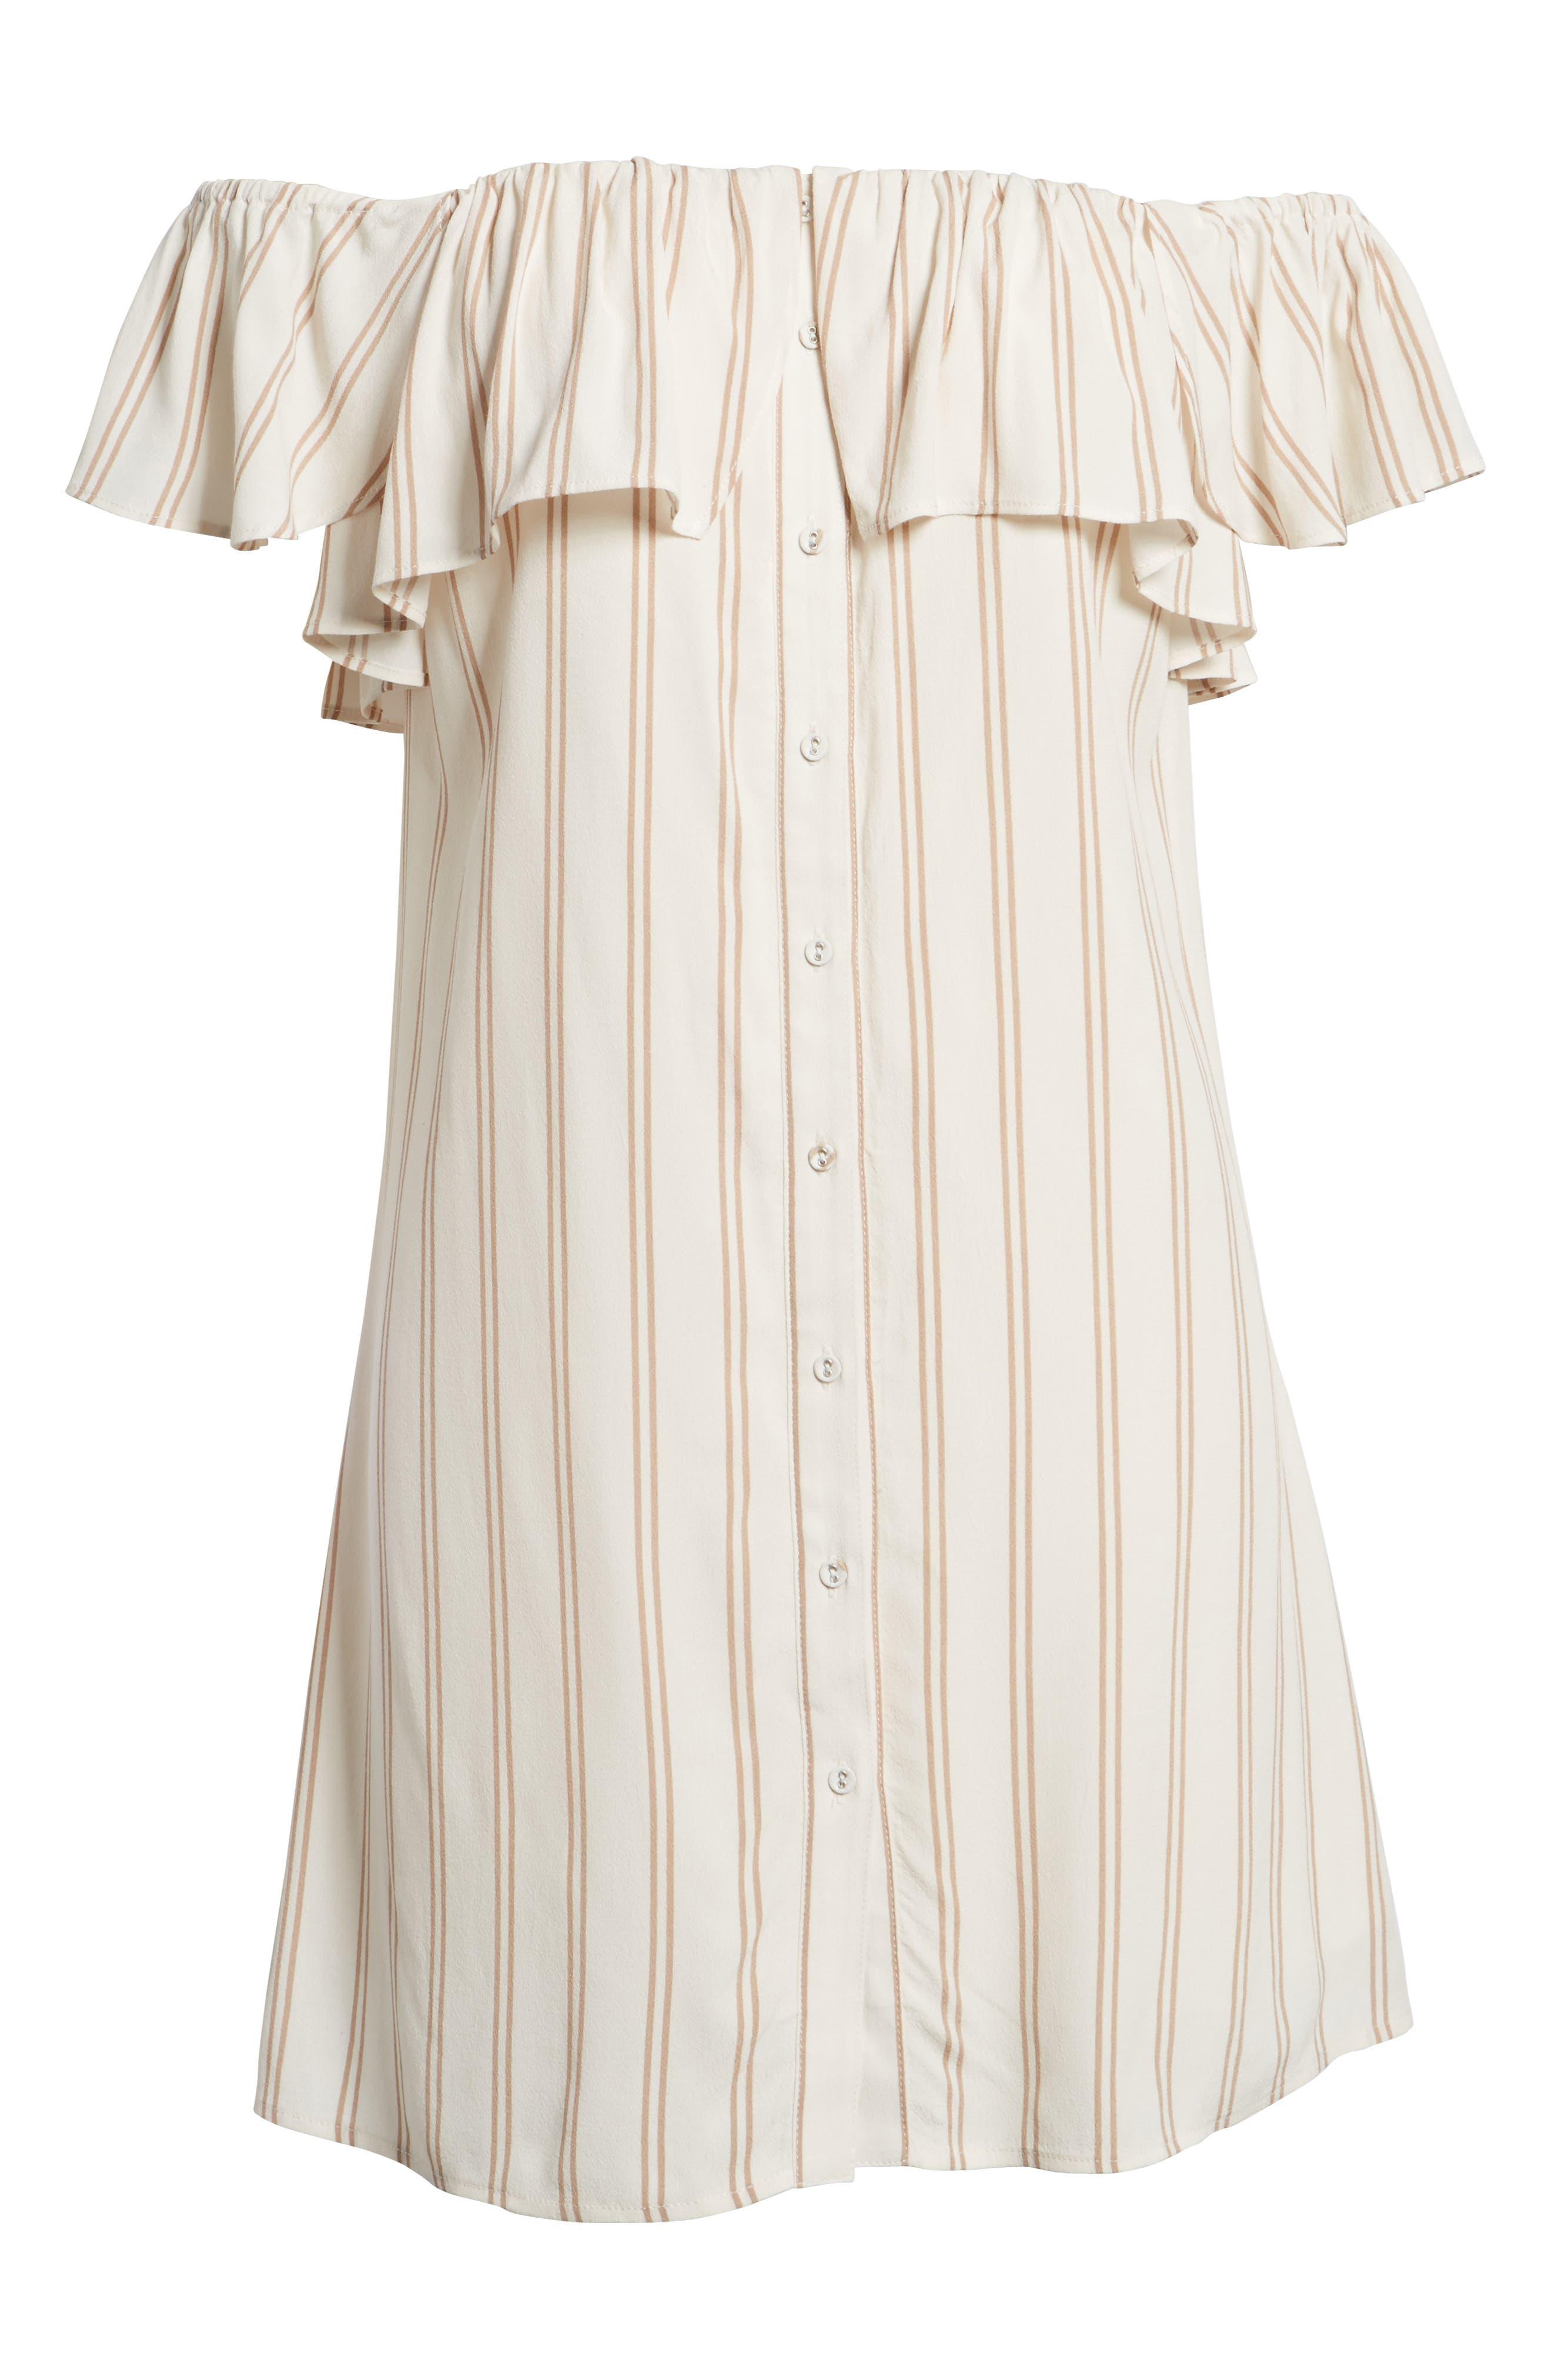 Stripe Off the Shoulder Dress,                             Alternate thumbnail 6, color,                             Ivory Egret Emily Stripe